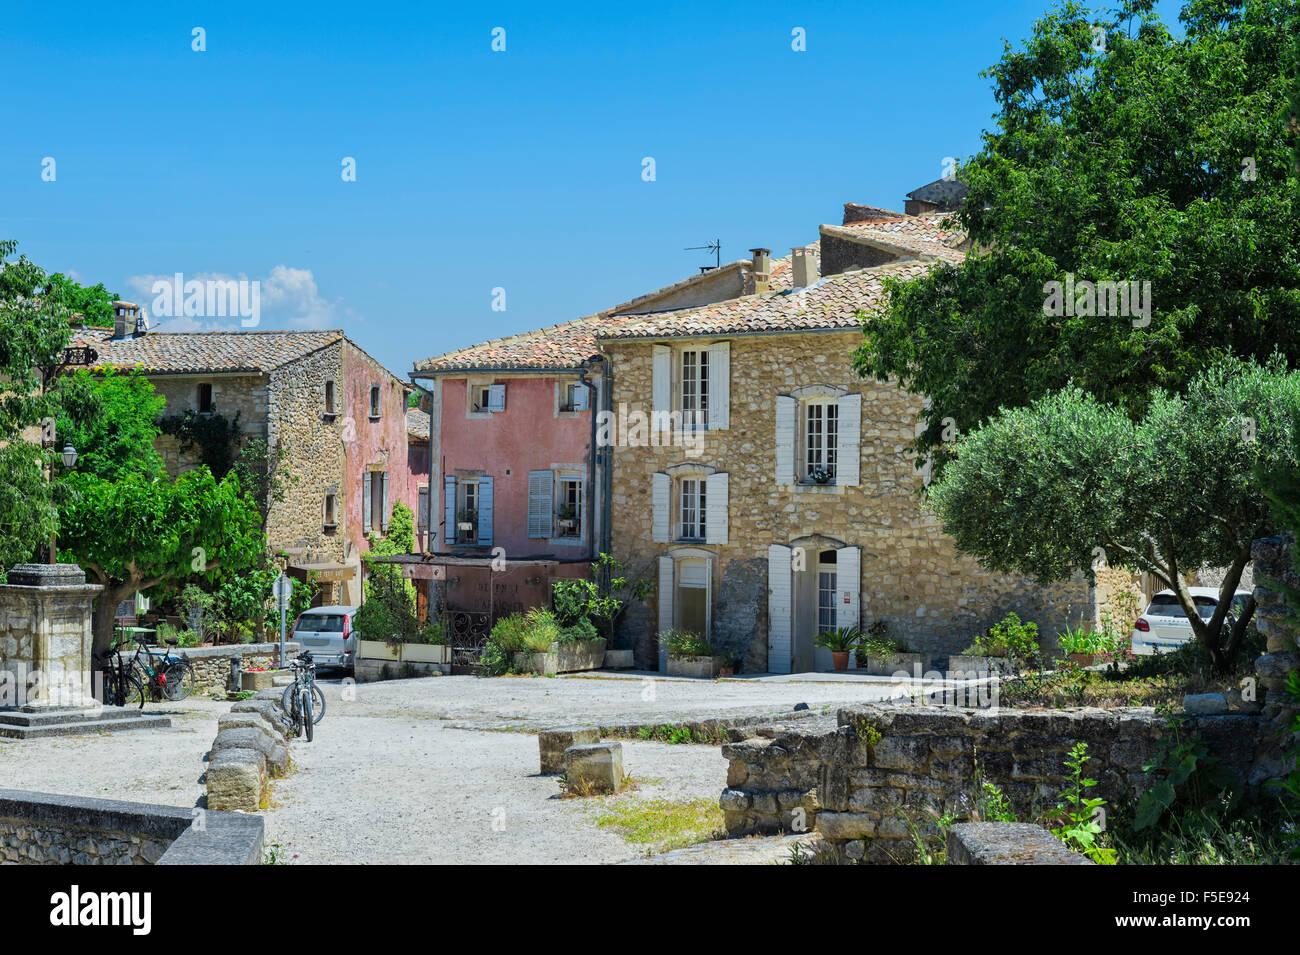 i@d vaucluse